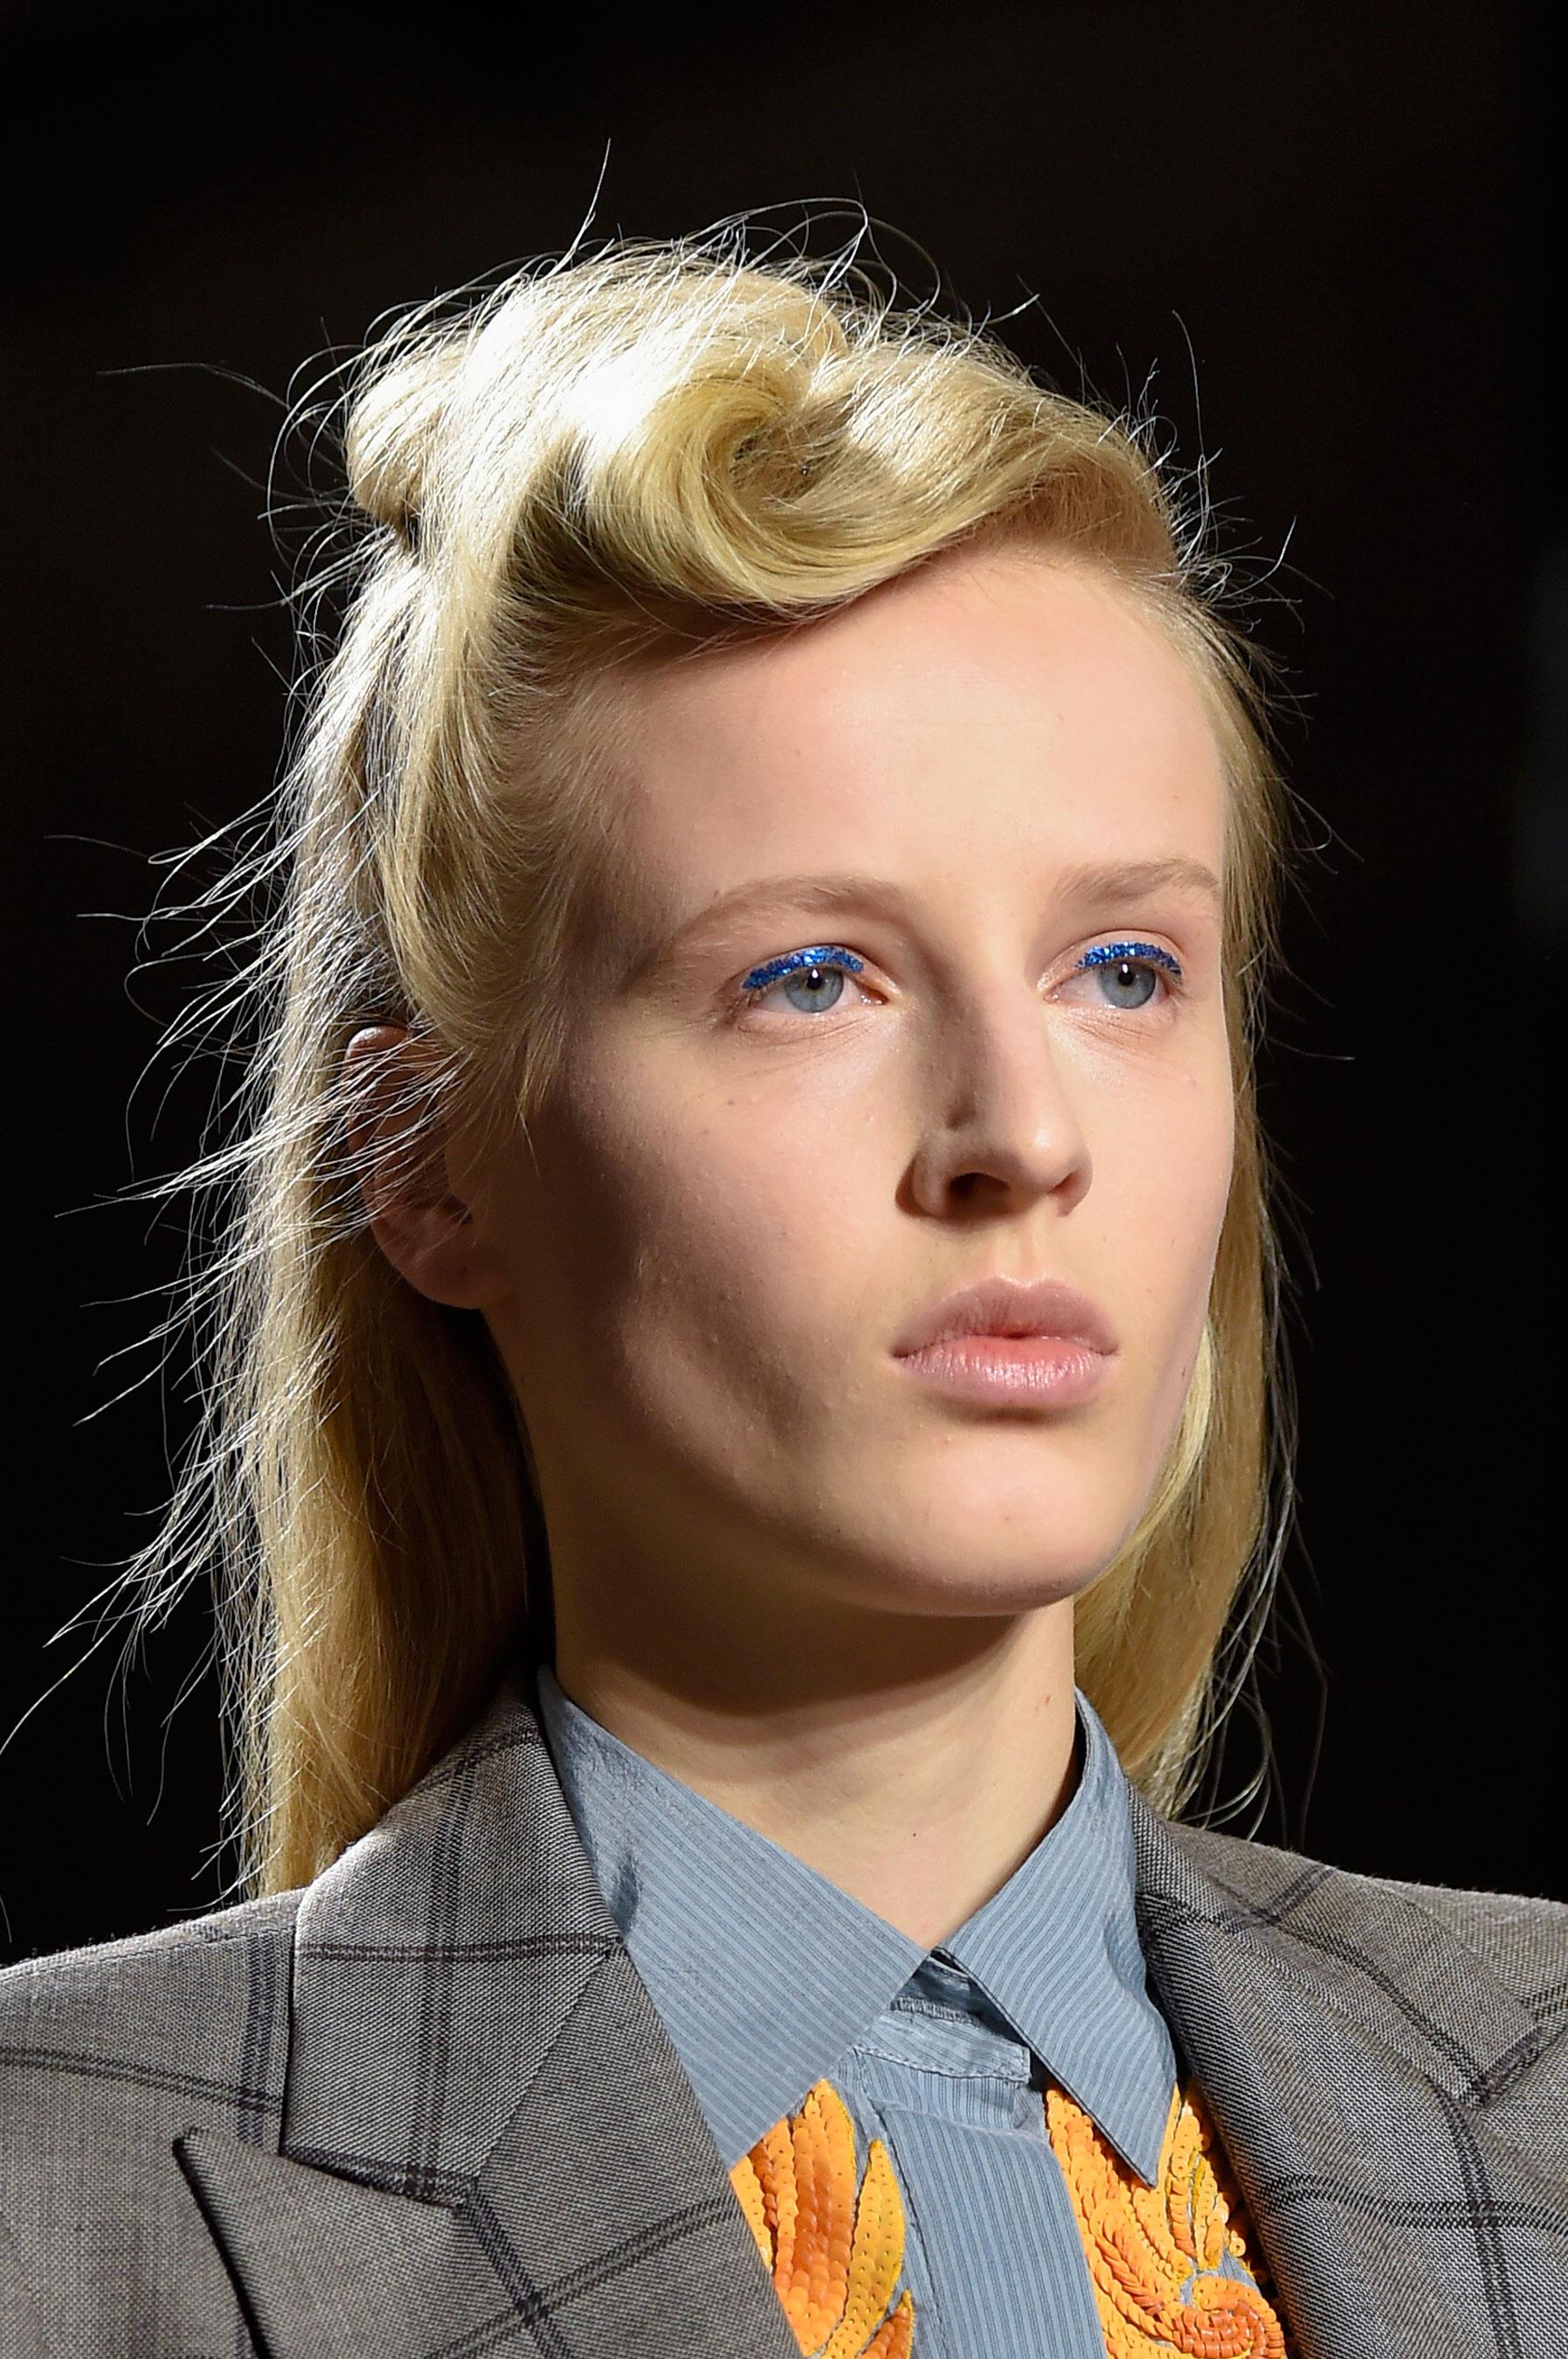 Dries-van-Noten-spring-2016-runway-beauty-fashion-show-the-impression-10